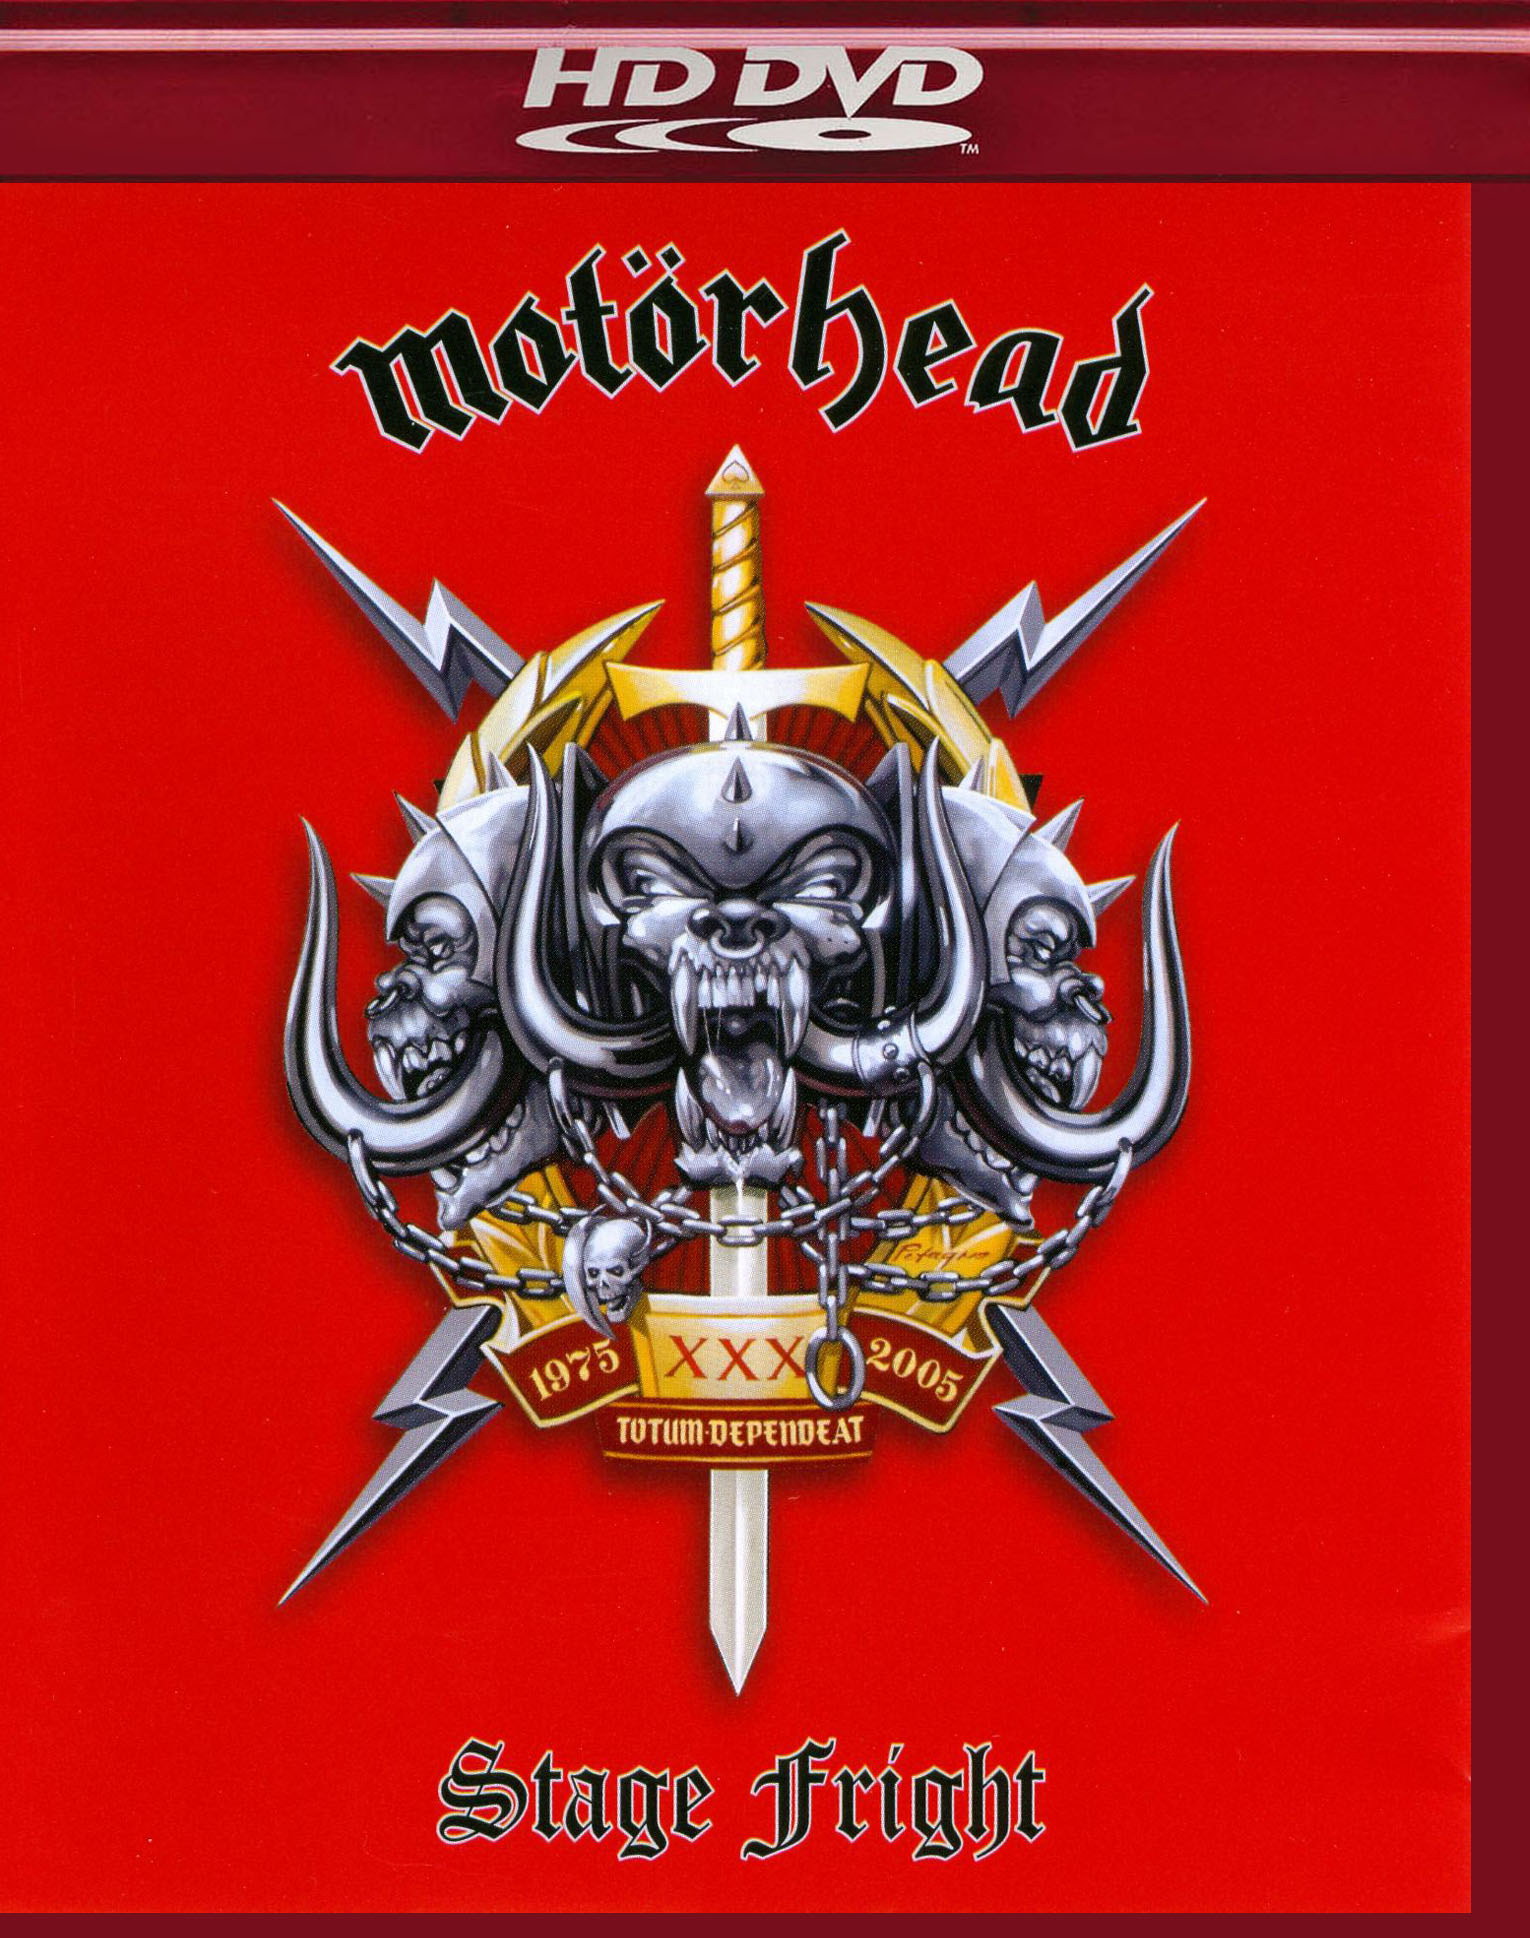 Motörhead: Stage Fright